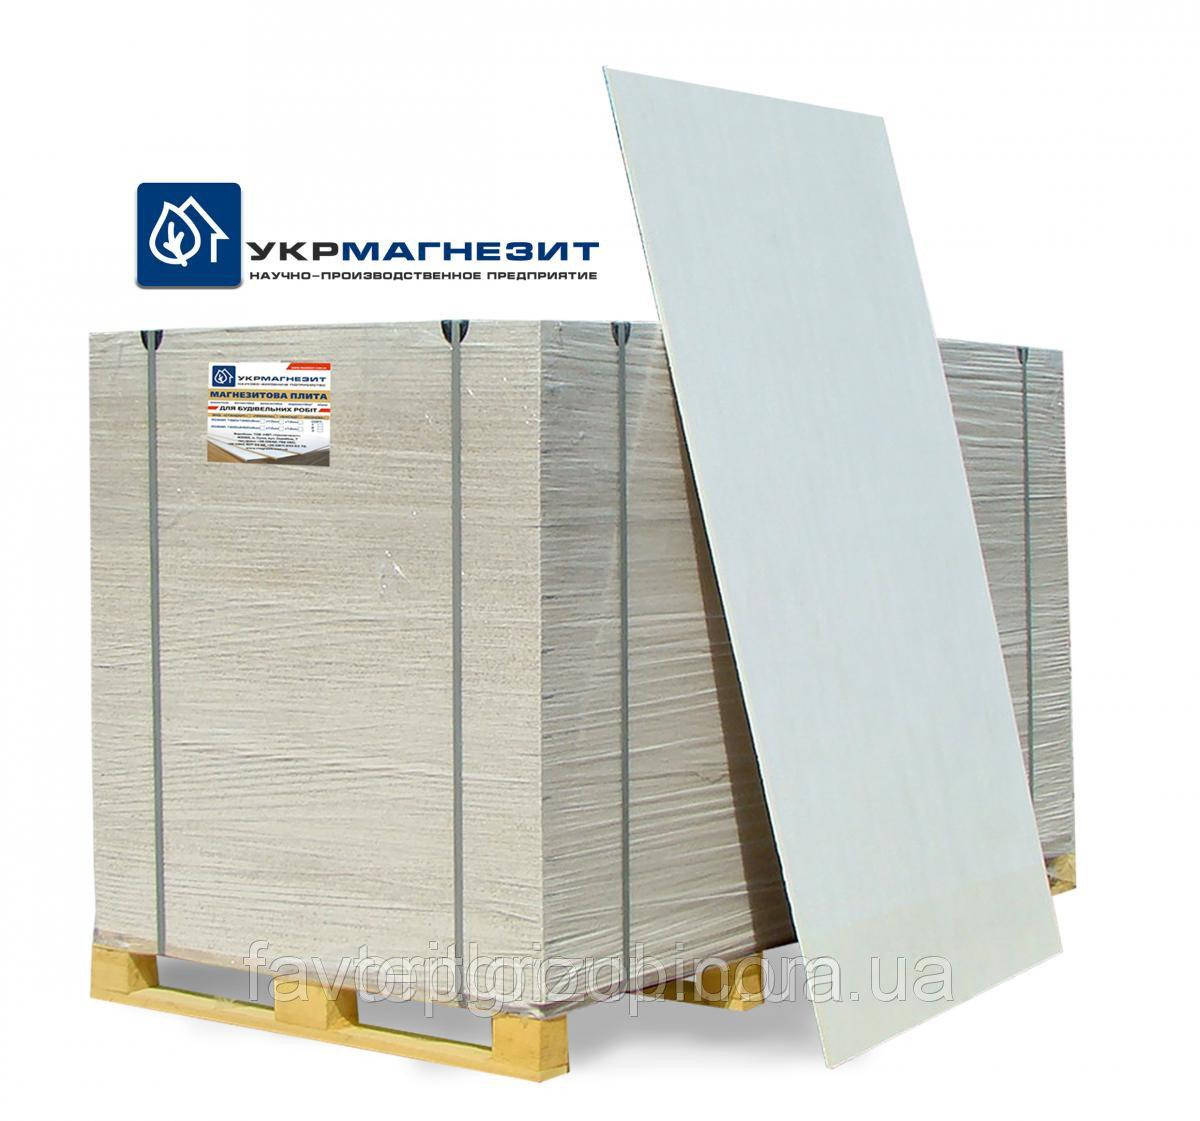 Магнезитовая плита Укрмагнезит Фасад 2 сорт 10х1200х2400 мм